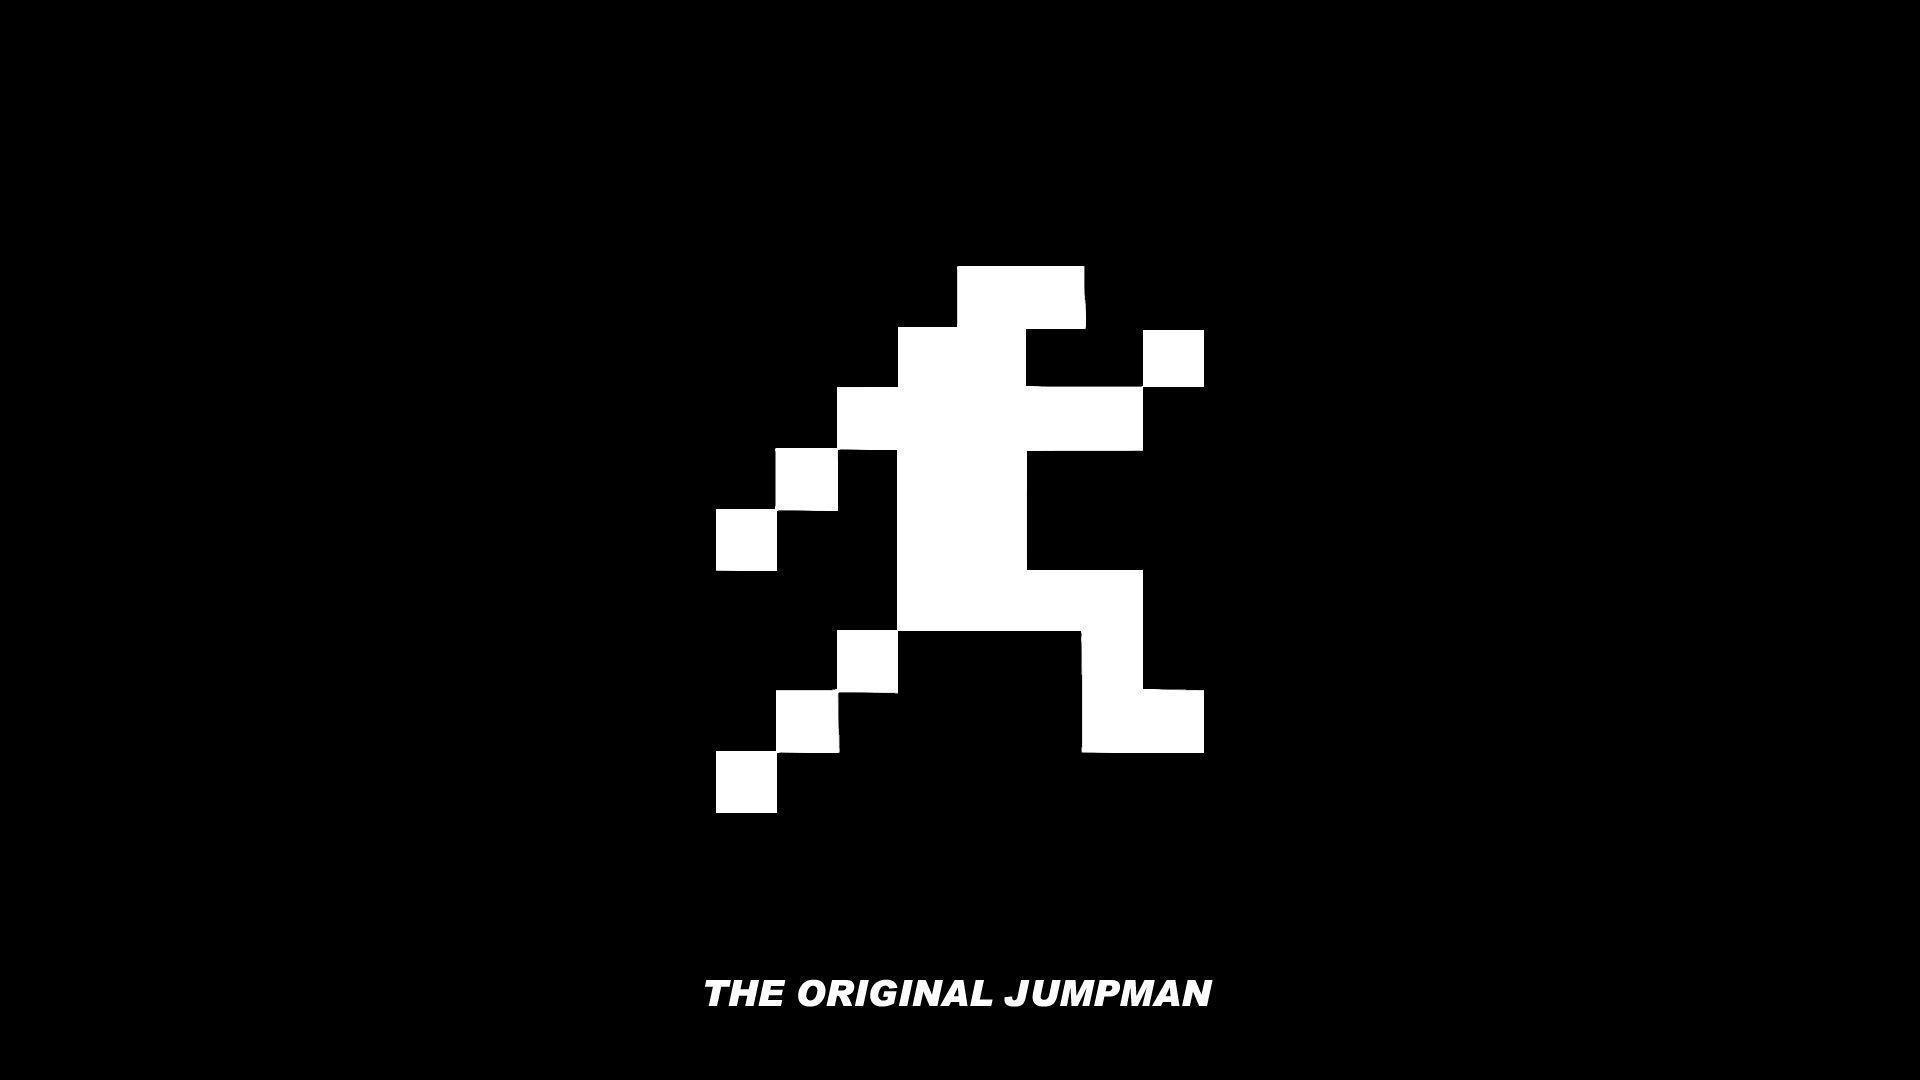 jumpman logo wallpapers